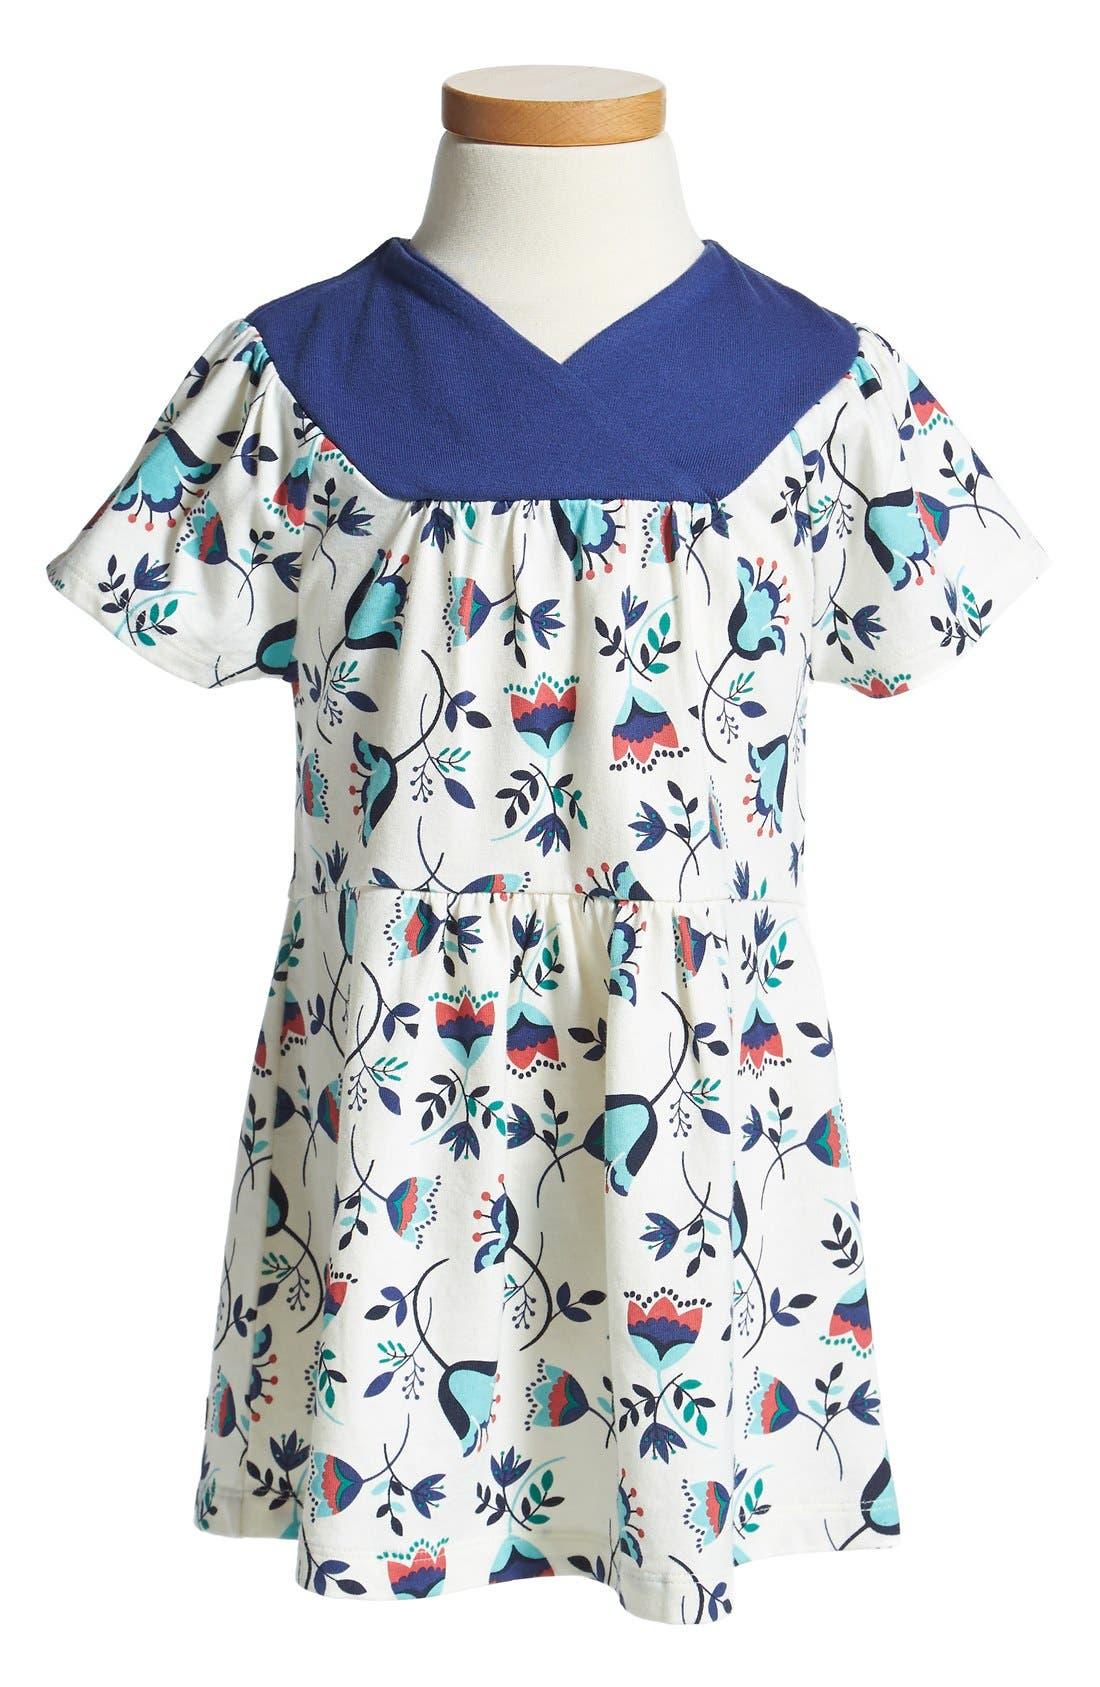 Alternate Image 1 Selected - Tea Collection 'Tulpenregen' Faux-Wrap Dress (Baby Girls)